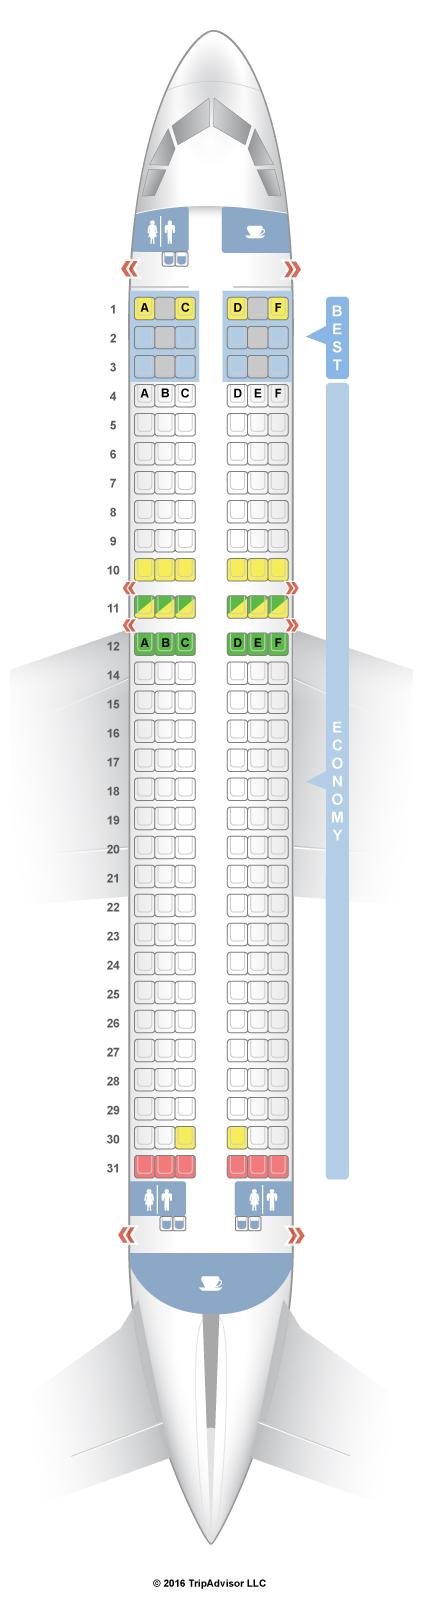 SeatGuru Seat Map Eurowings Airbus A320 (320)